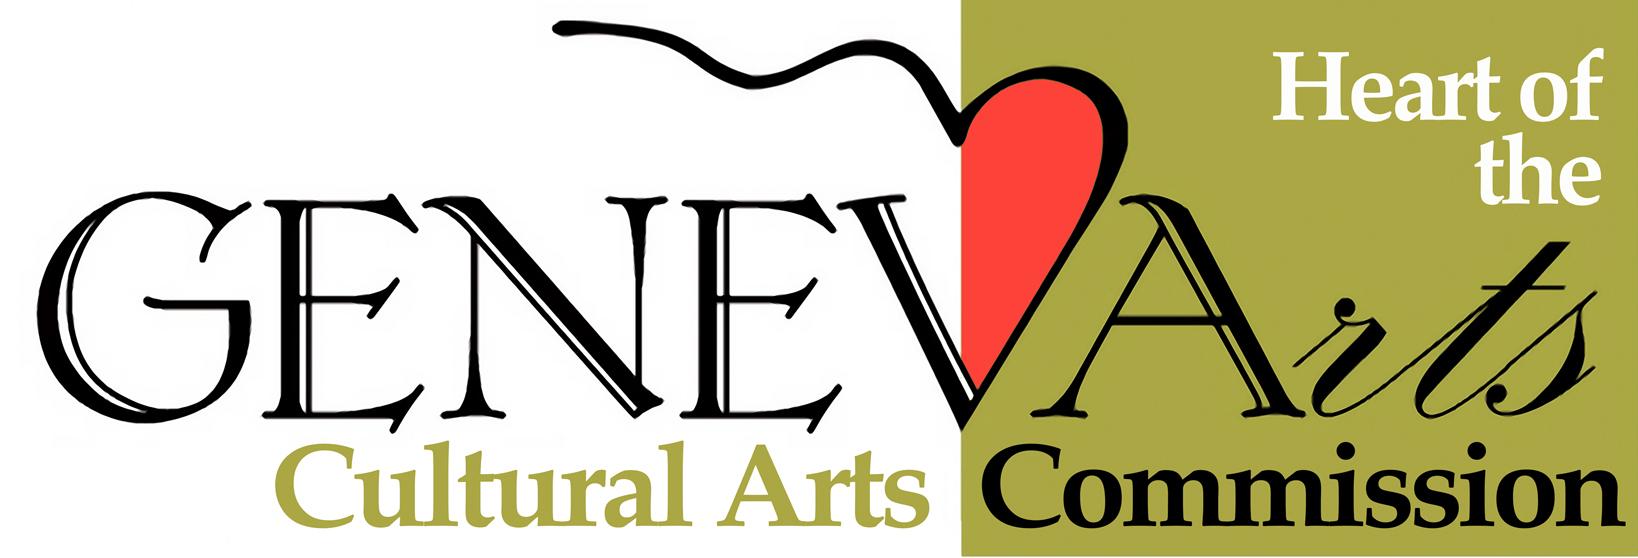 Cultural Arts Commission